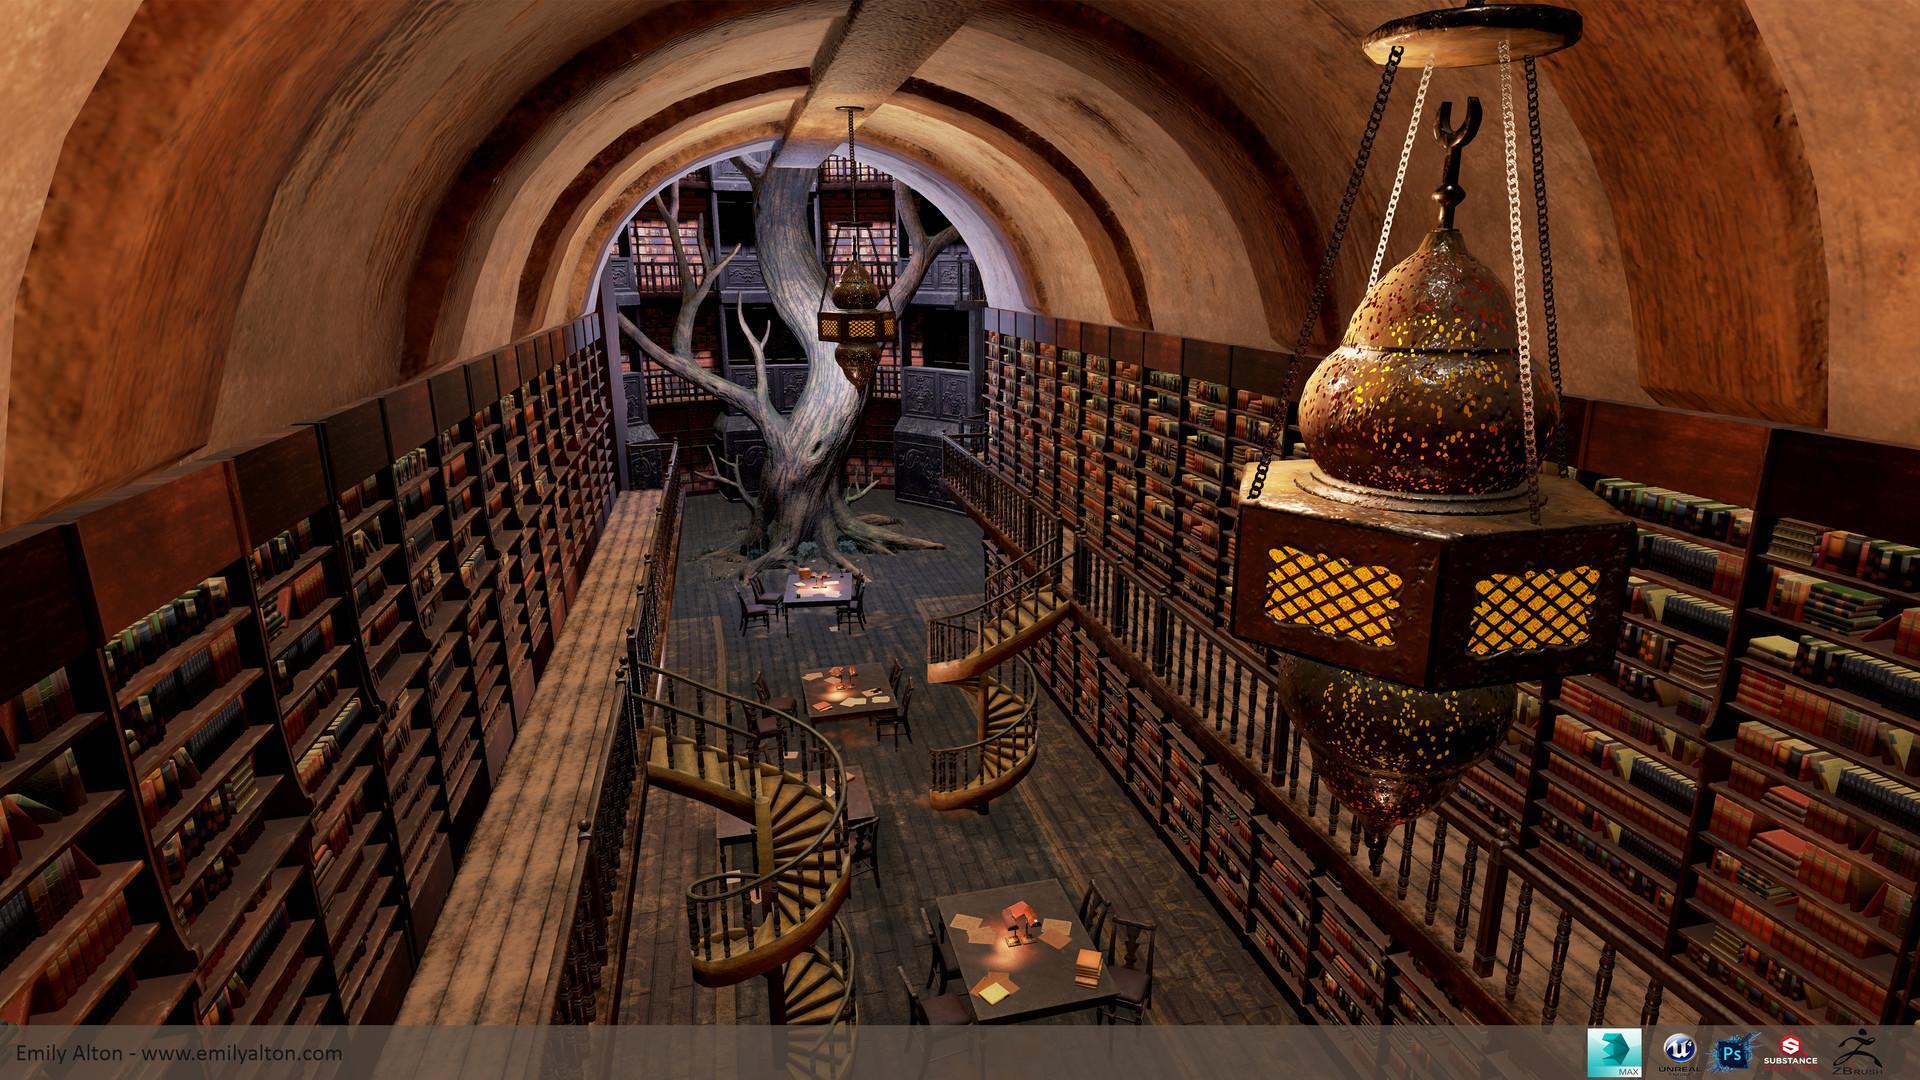 ArtStation - Fantasy Library, Emily Alton